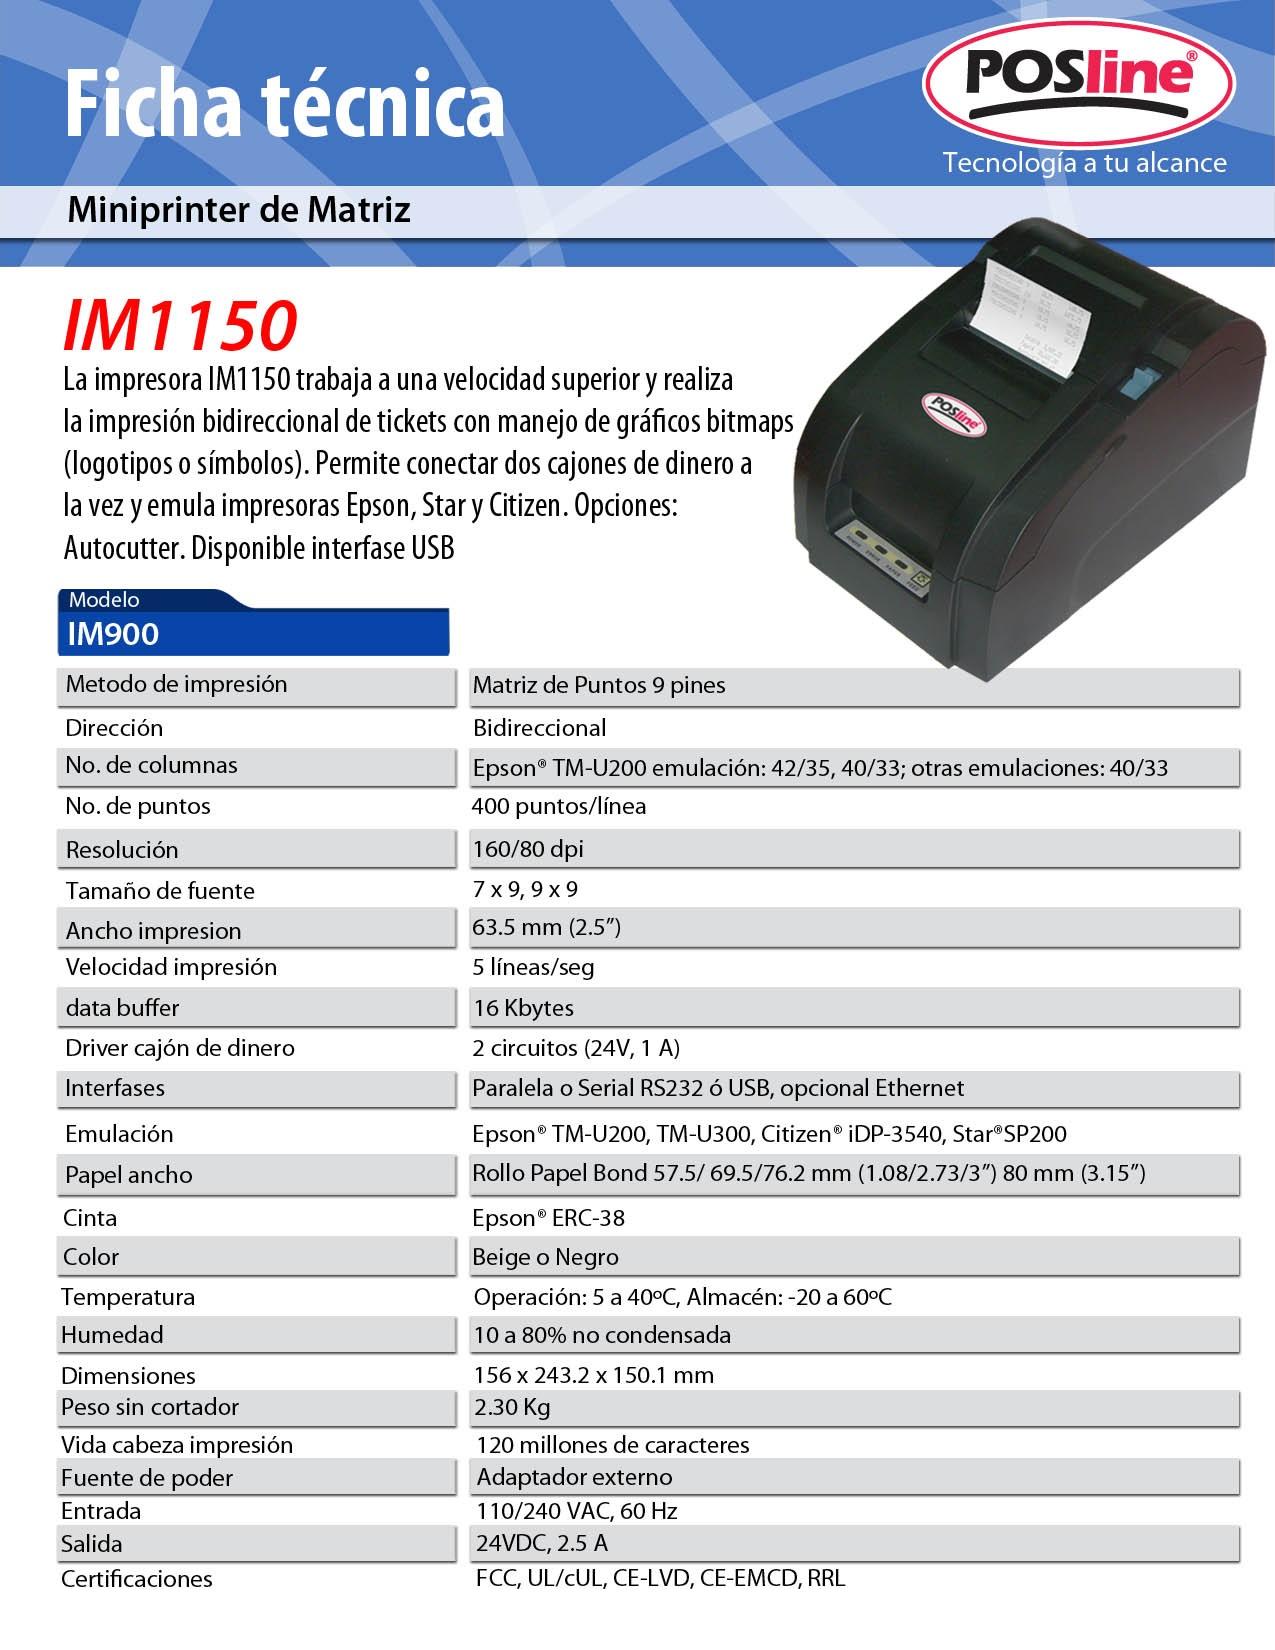 IM1150 CARACTERISTICAS